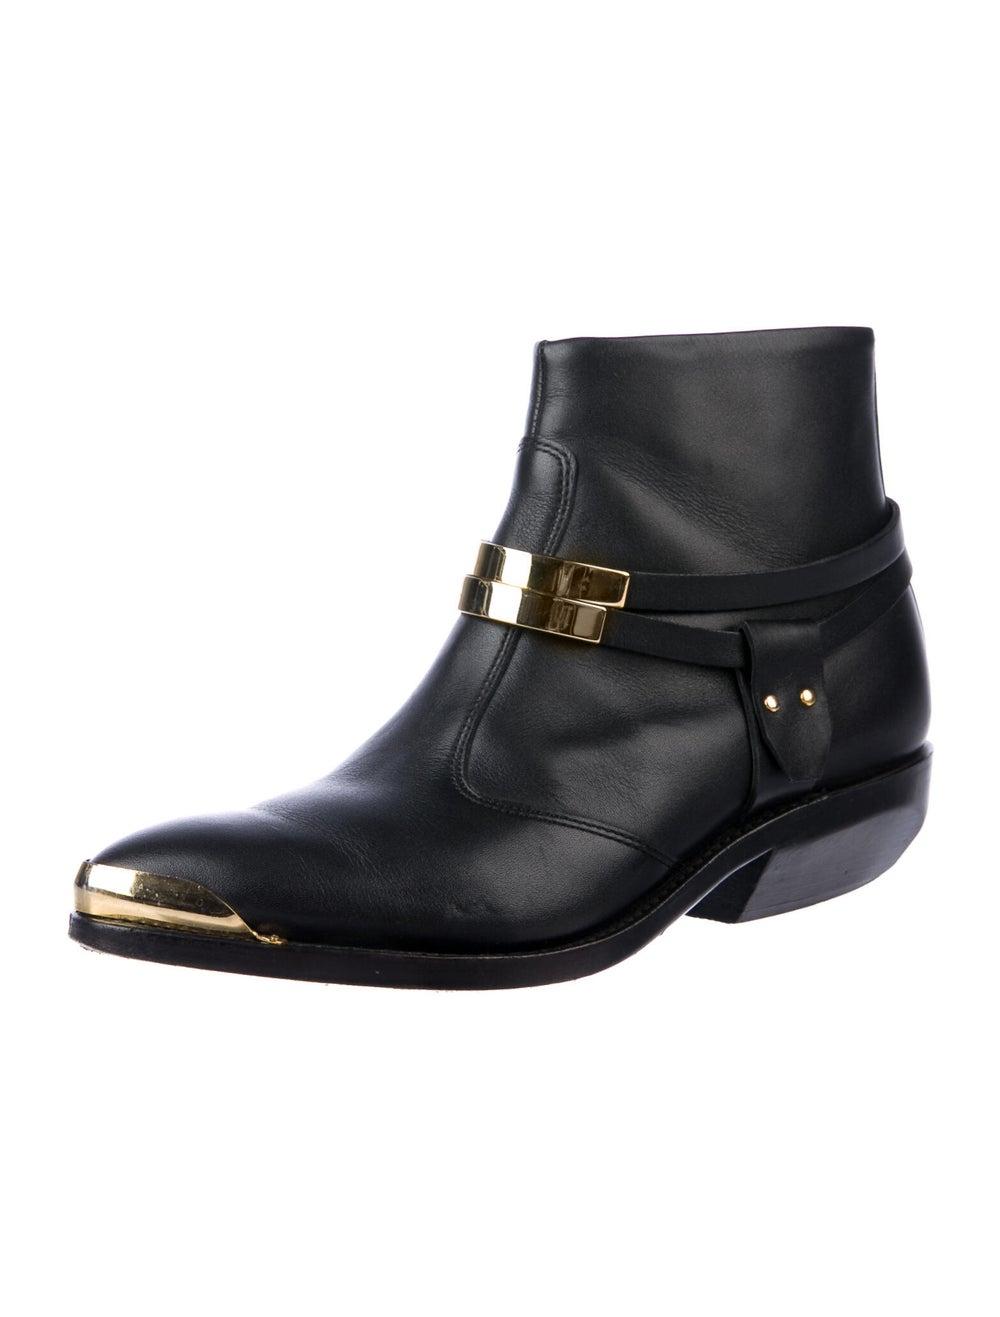 Balmain Leather Western Boots Black - image 2